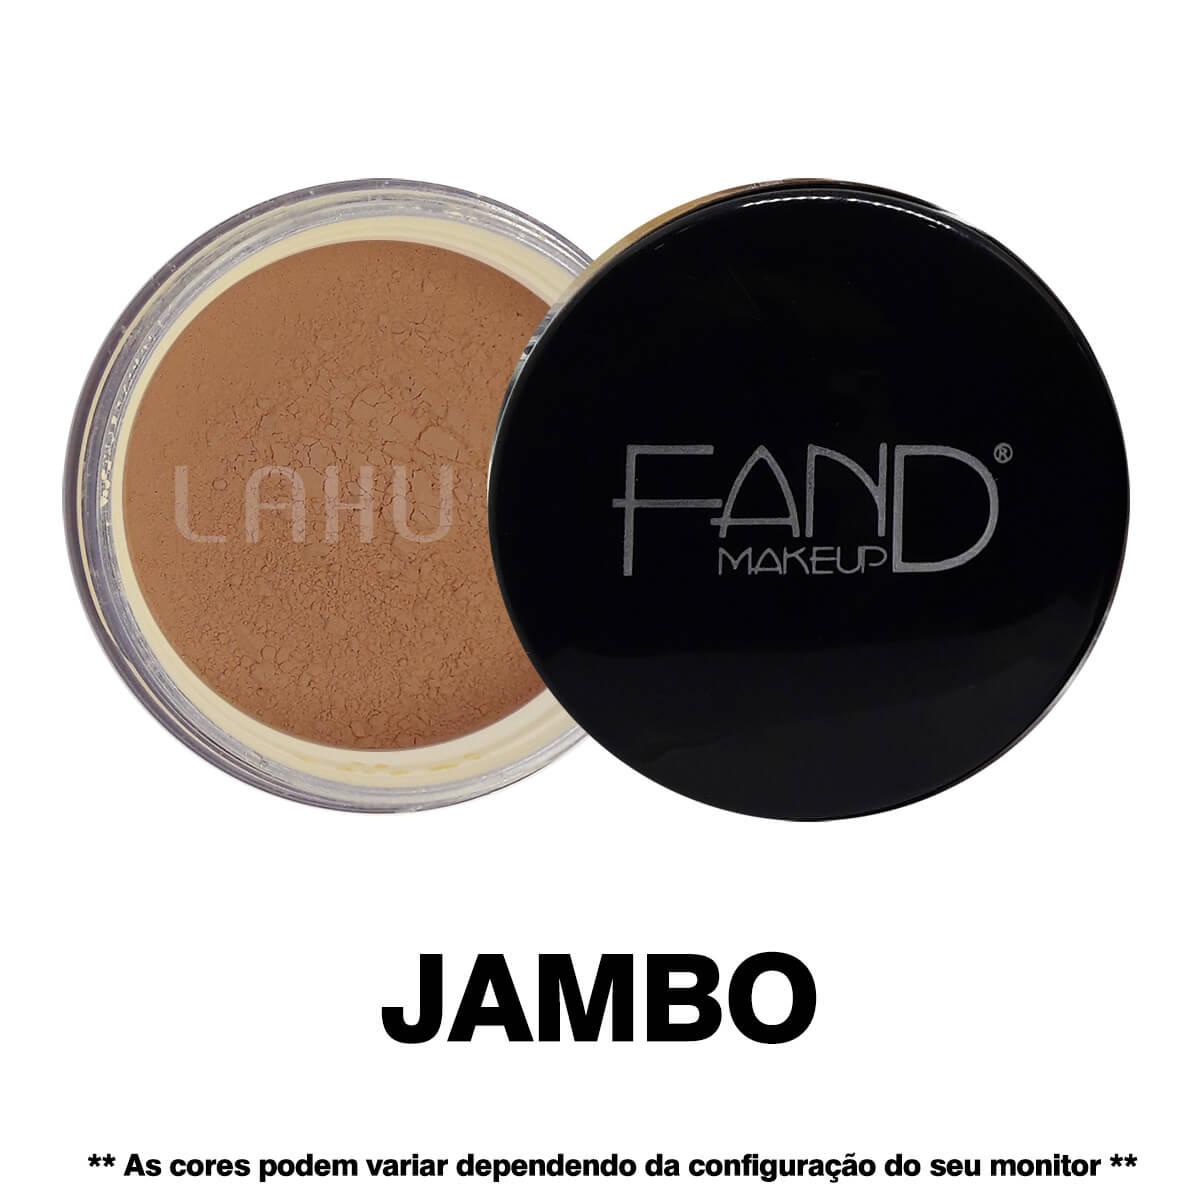 Pó Facial Solto Jambo Fand Makeup